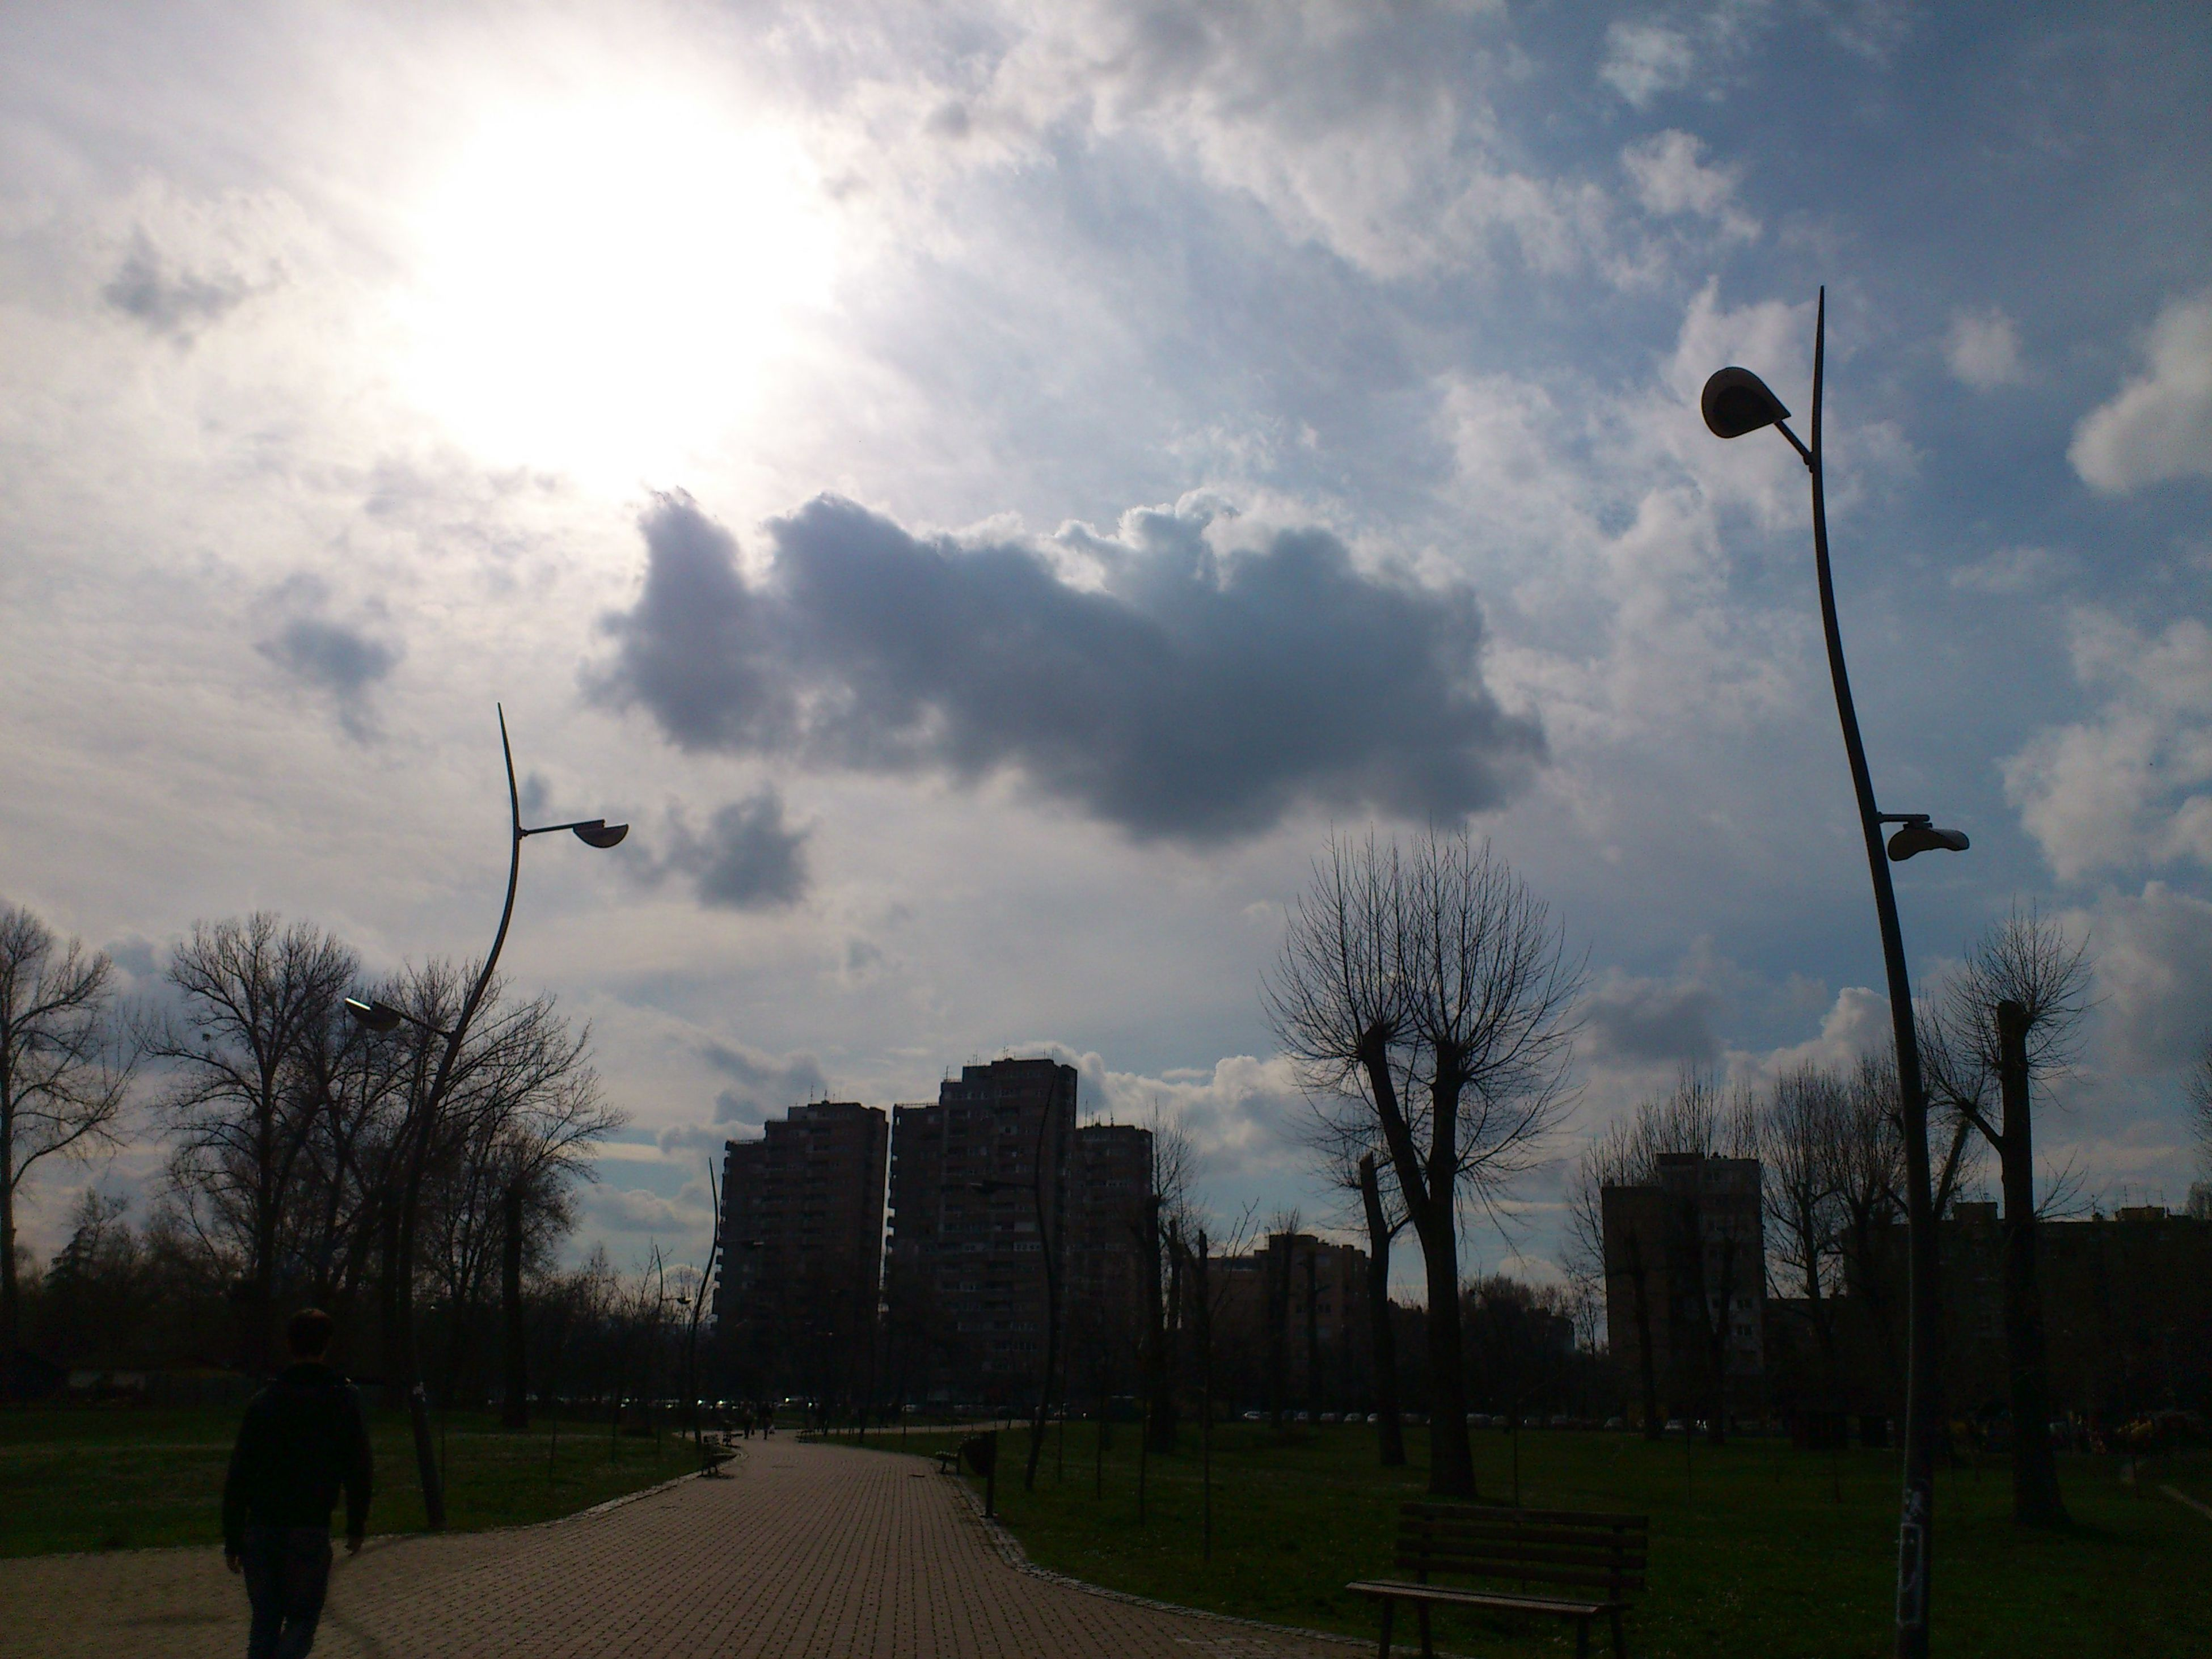 building exterior, sky, architecture, built structure, cloud - sky, street light, tree, city, silhouette, cloud, sunlight, street, sun, men, cloudy, bare tree, lifestyles, road, incidental people